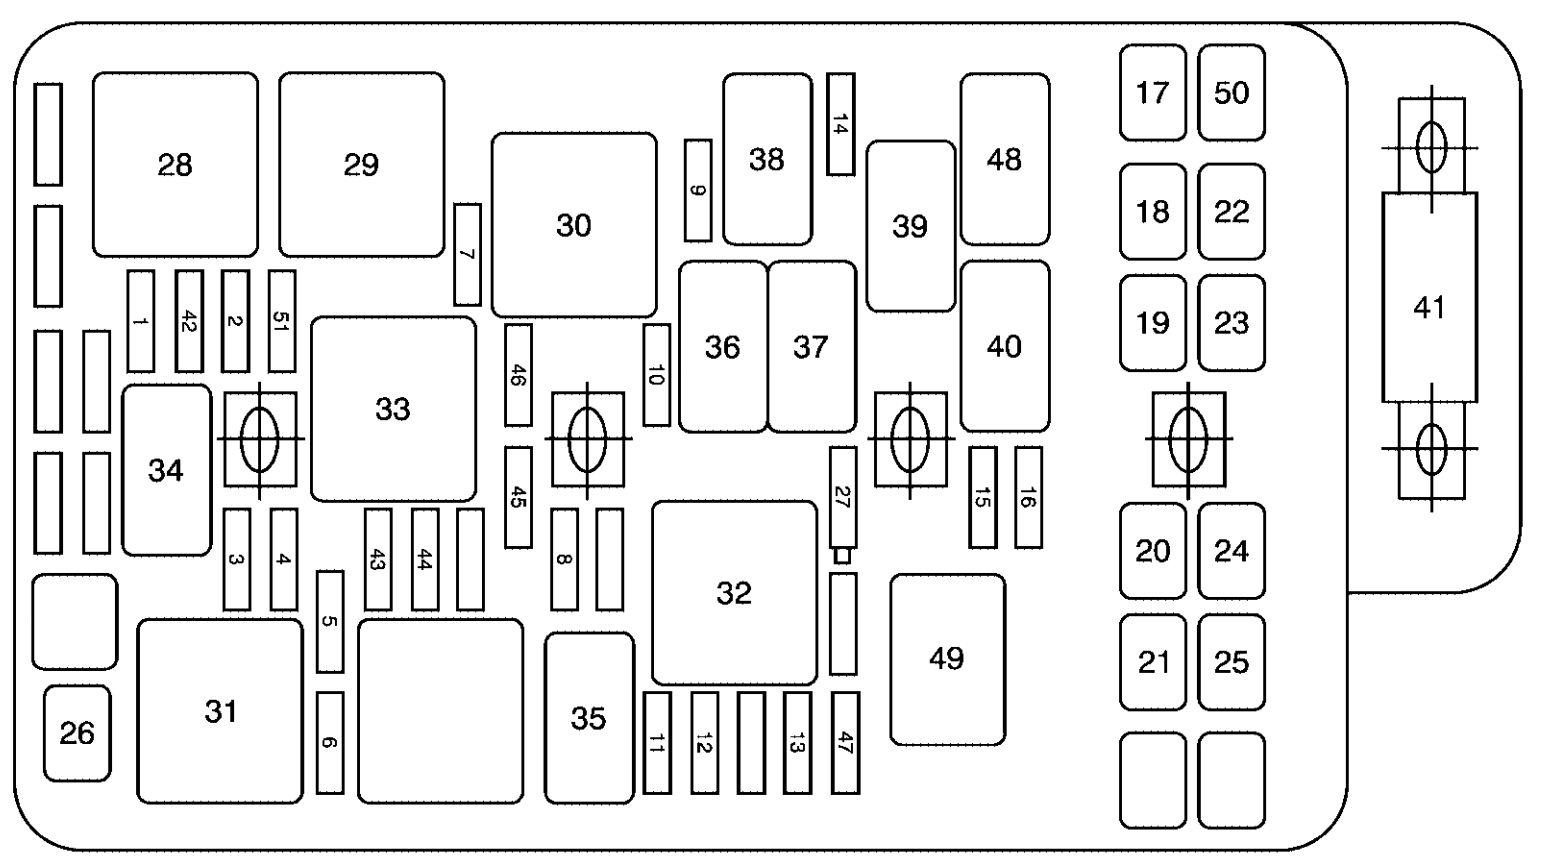 2010 pontiac vibe radio wiring diagram cobalt headlight g6 fuse schematic 2006 location best library battery